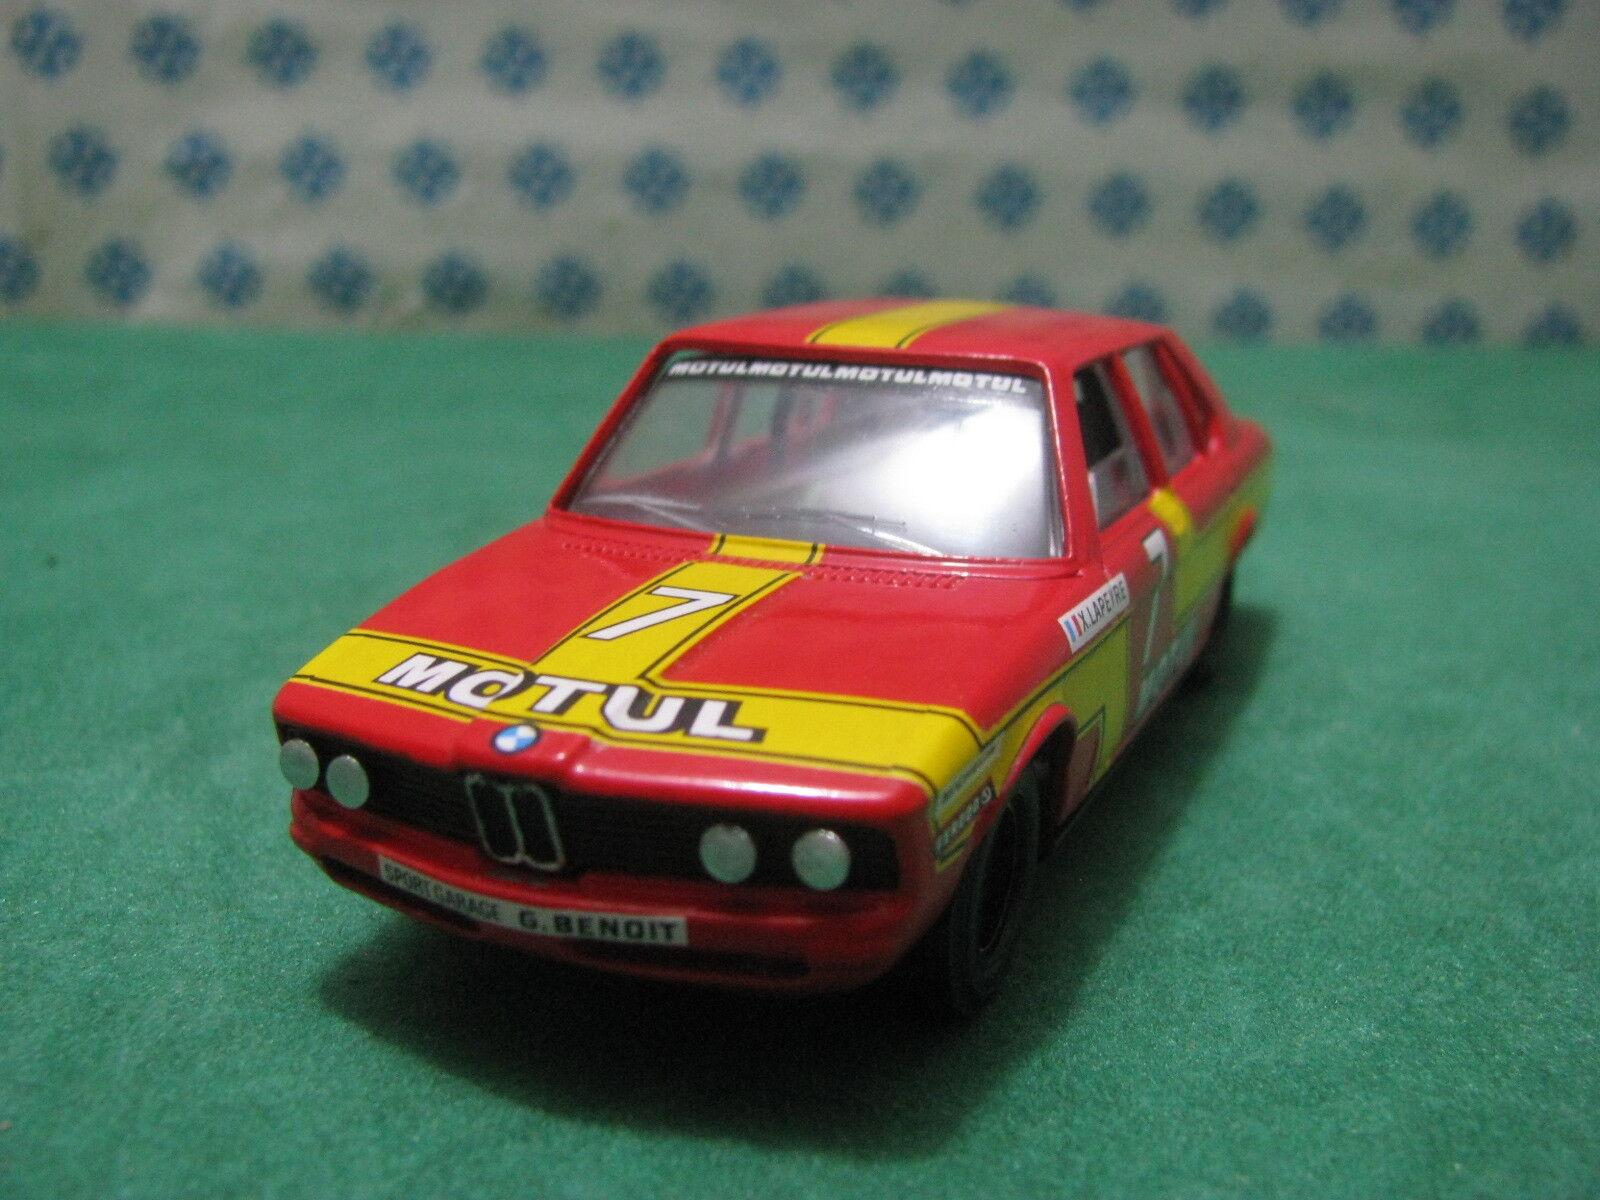 Vintage - BMW 530 Berline 3000cc. Motul - 1 43 Transkit Solide